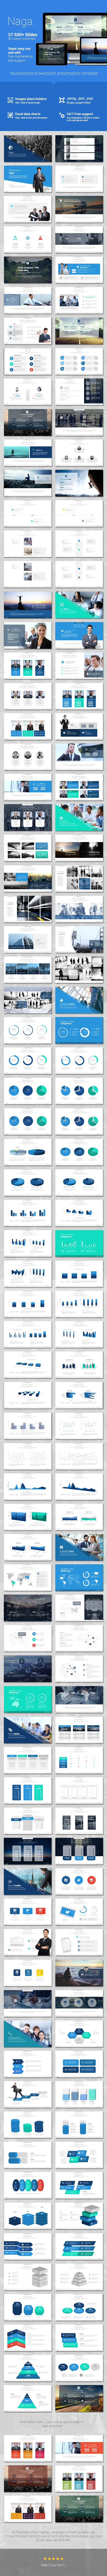 naga powerpoint presentation template naga is a professional